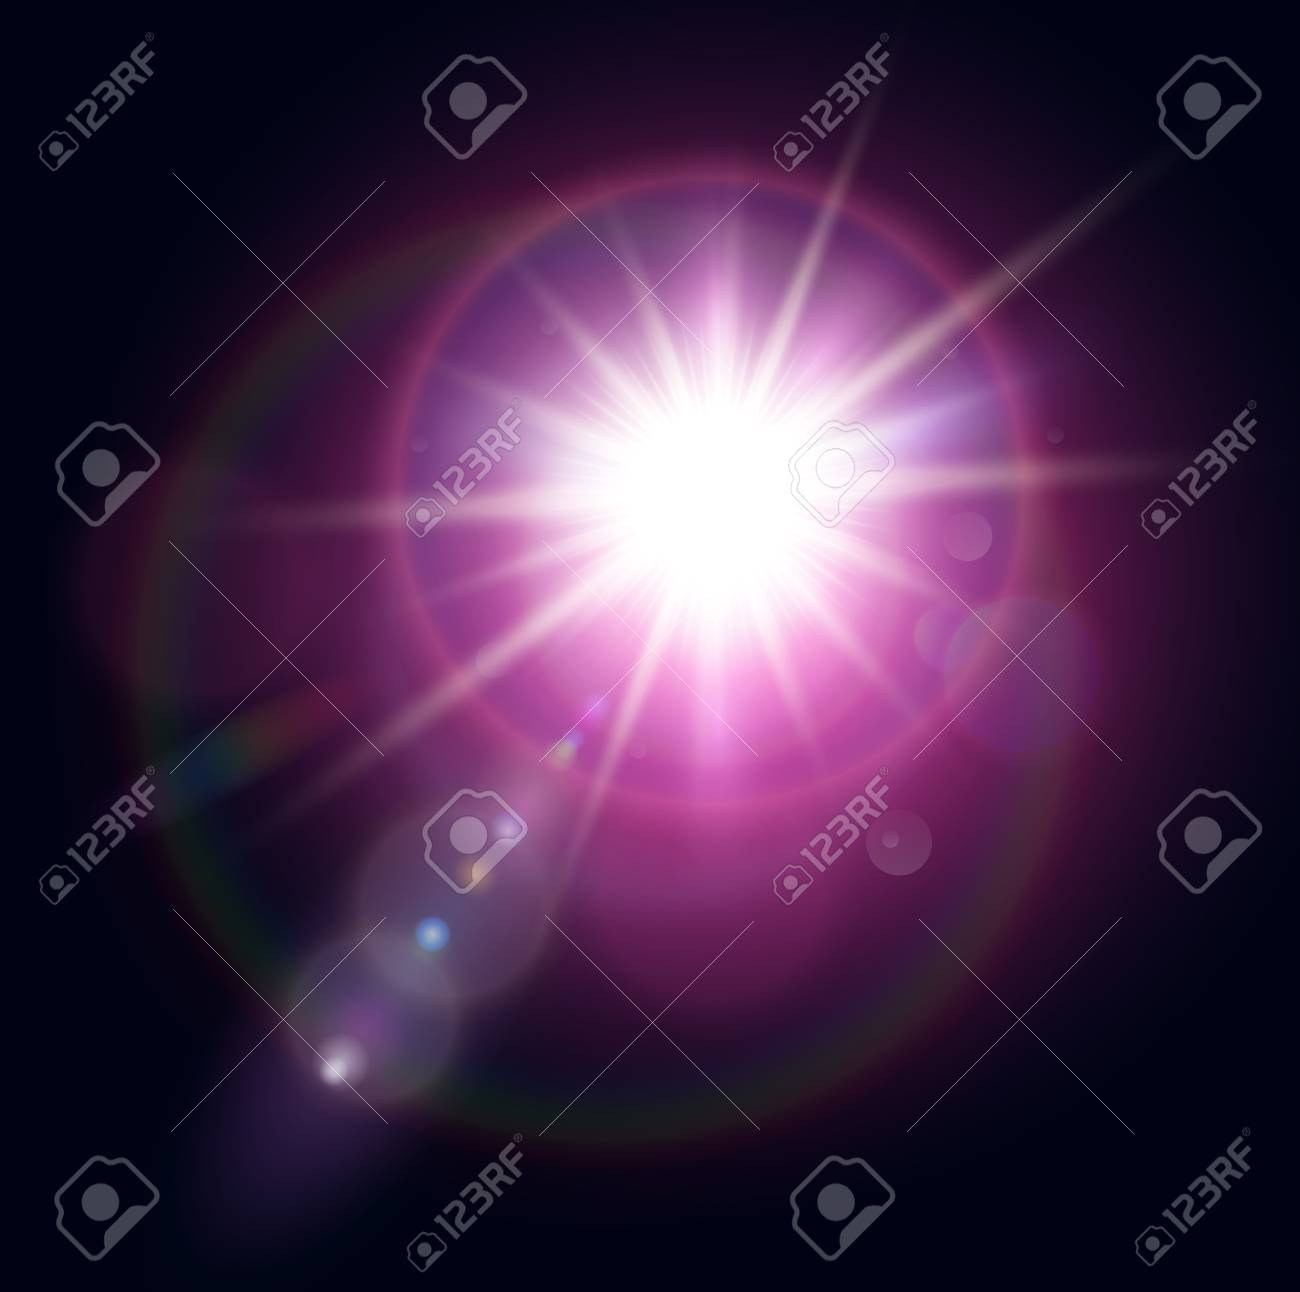 Vector star, sun with lens flare. Stock Vector - 22426026